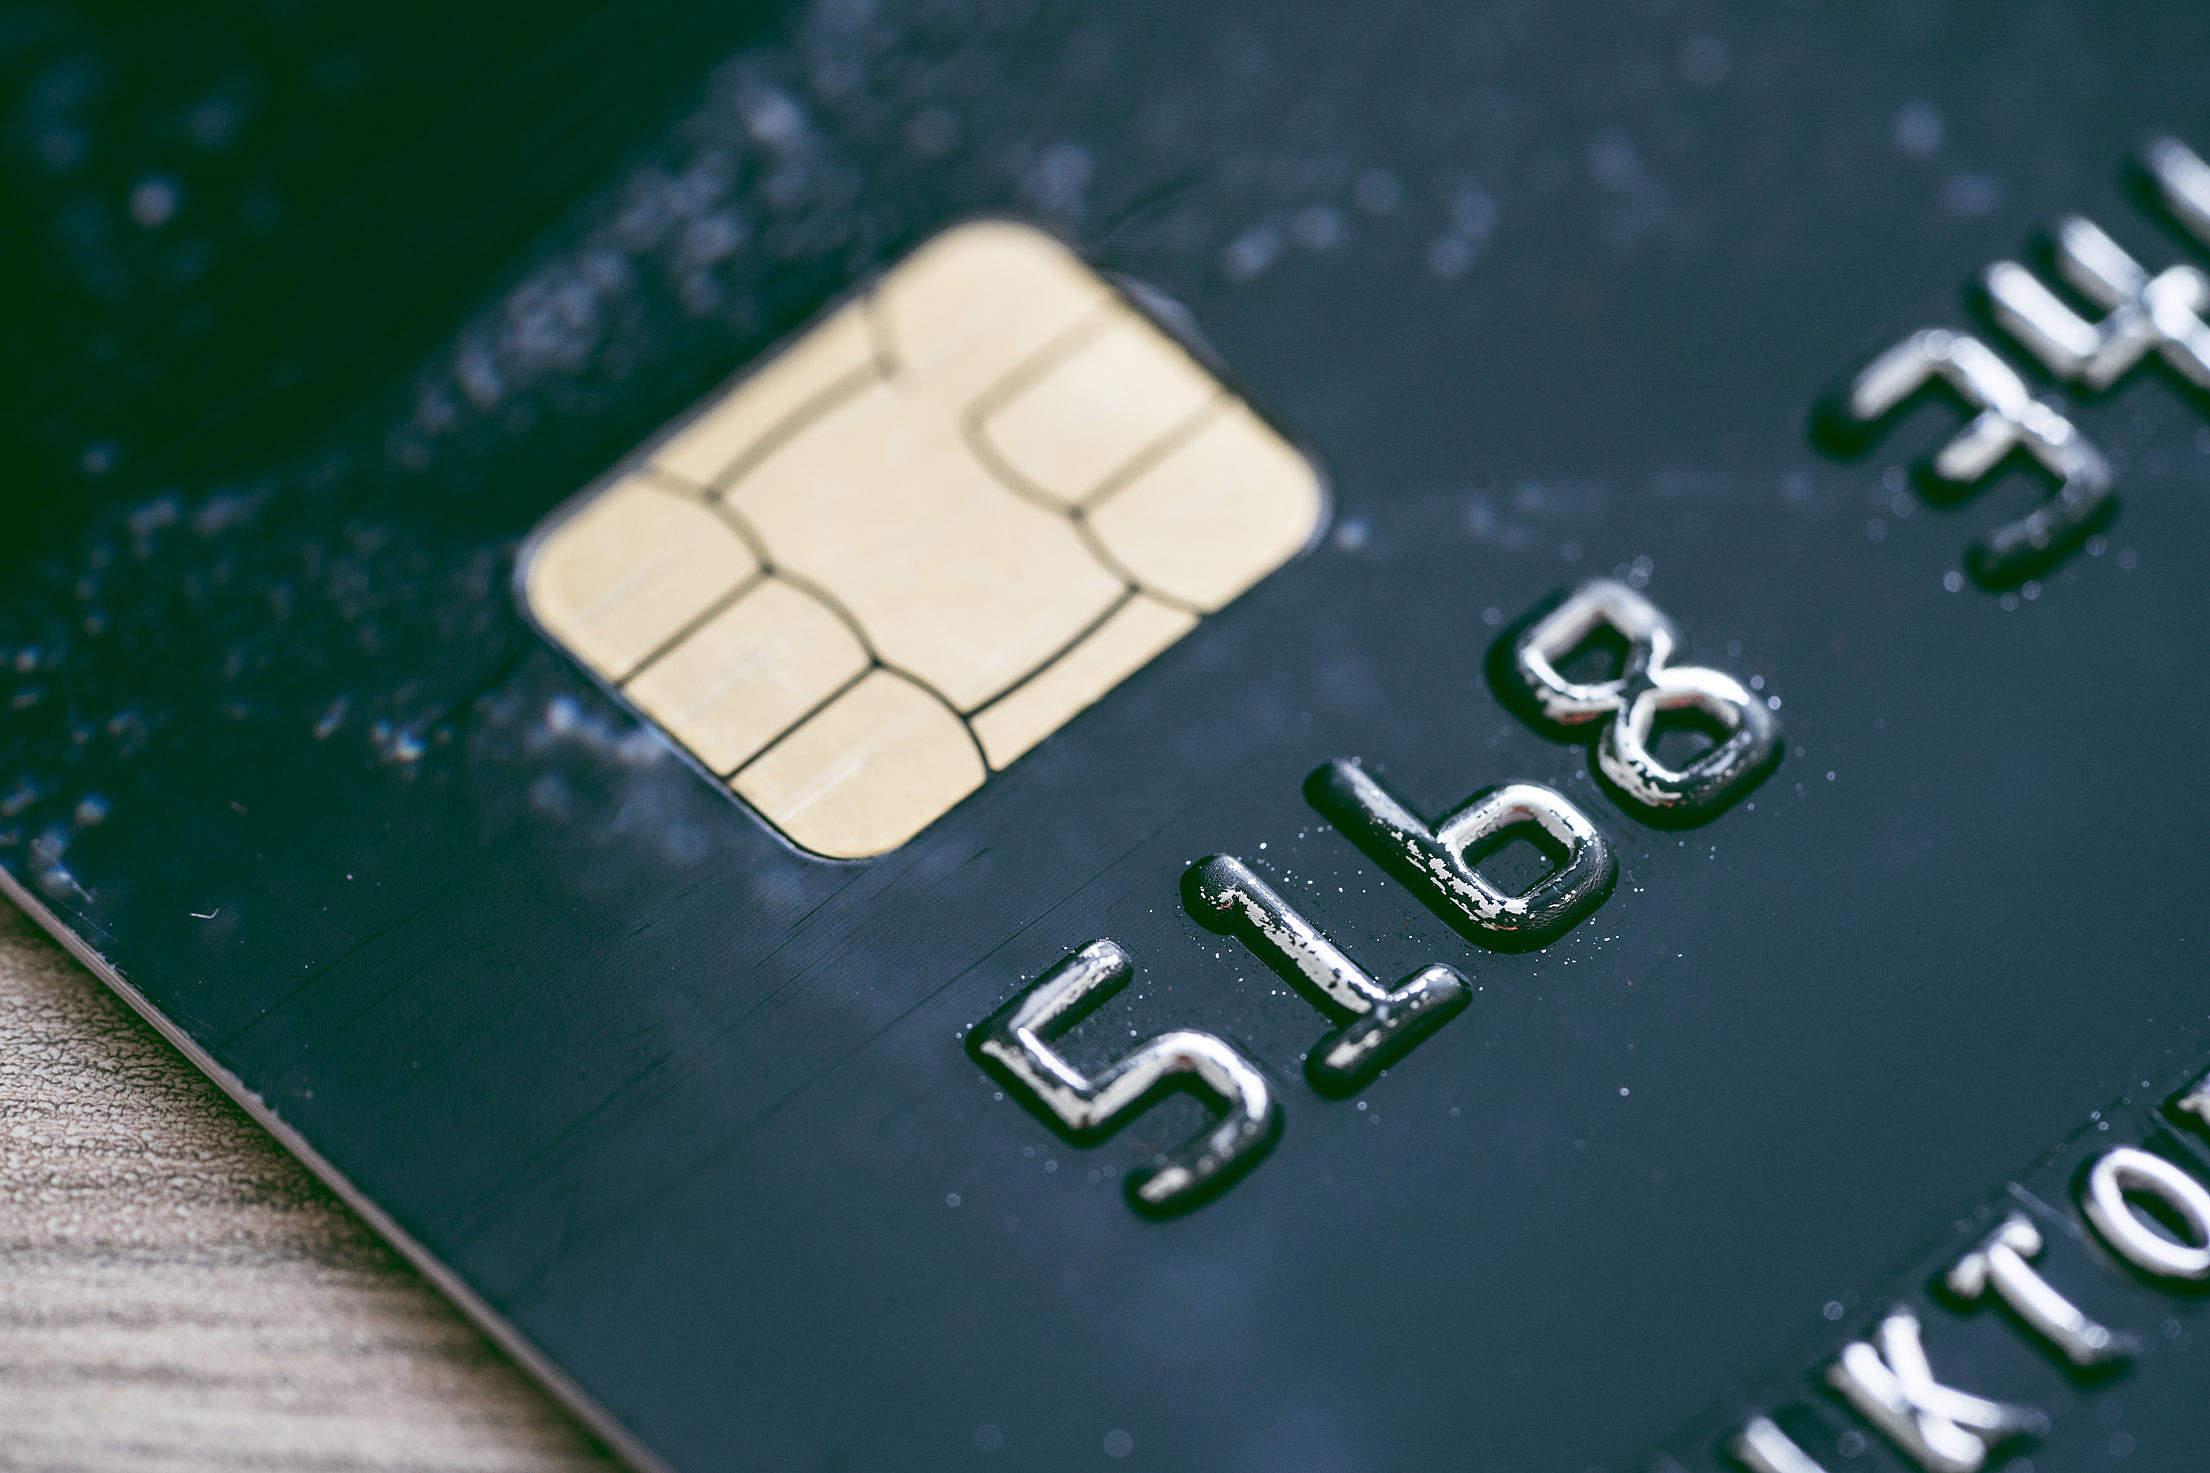 credit-bank-card-chip-close-up_free_stock_photos_picjumbo_DSC09996-2210x1473.jpg